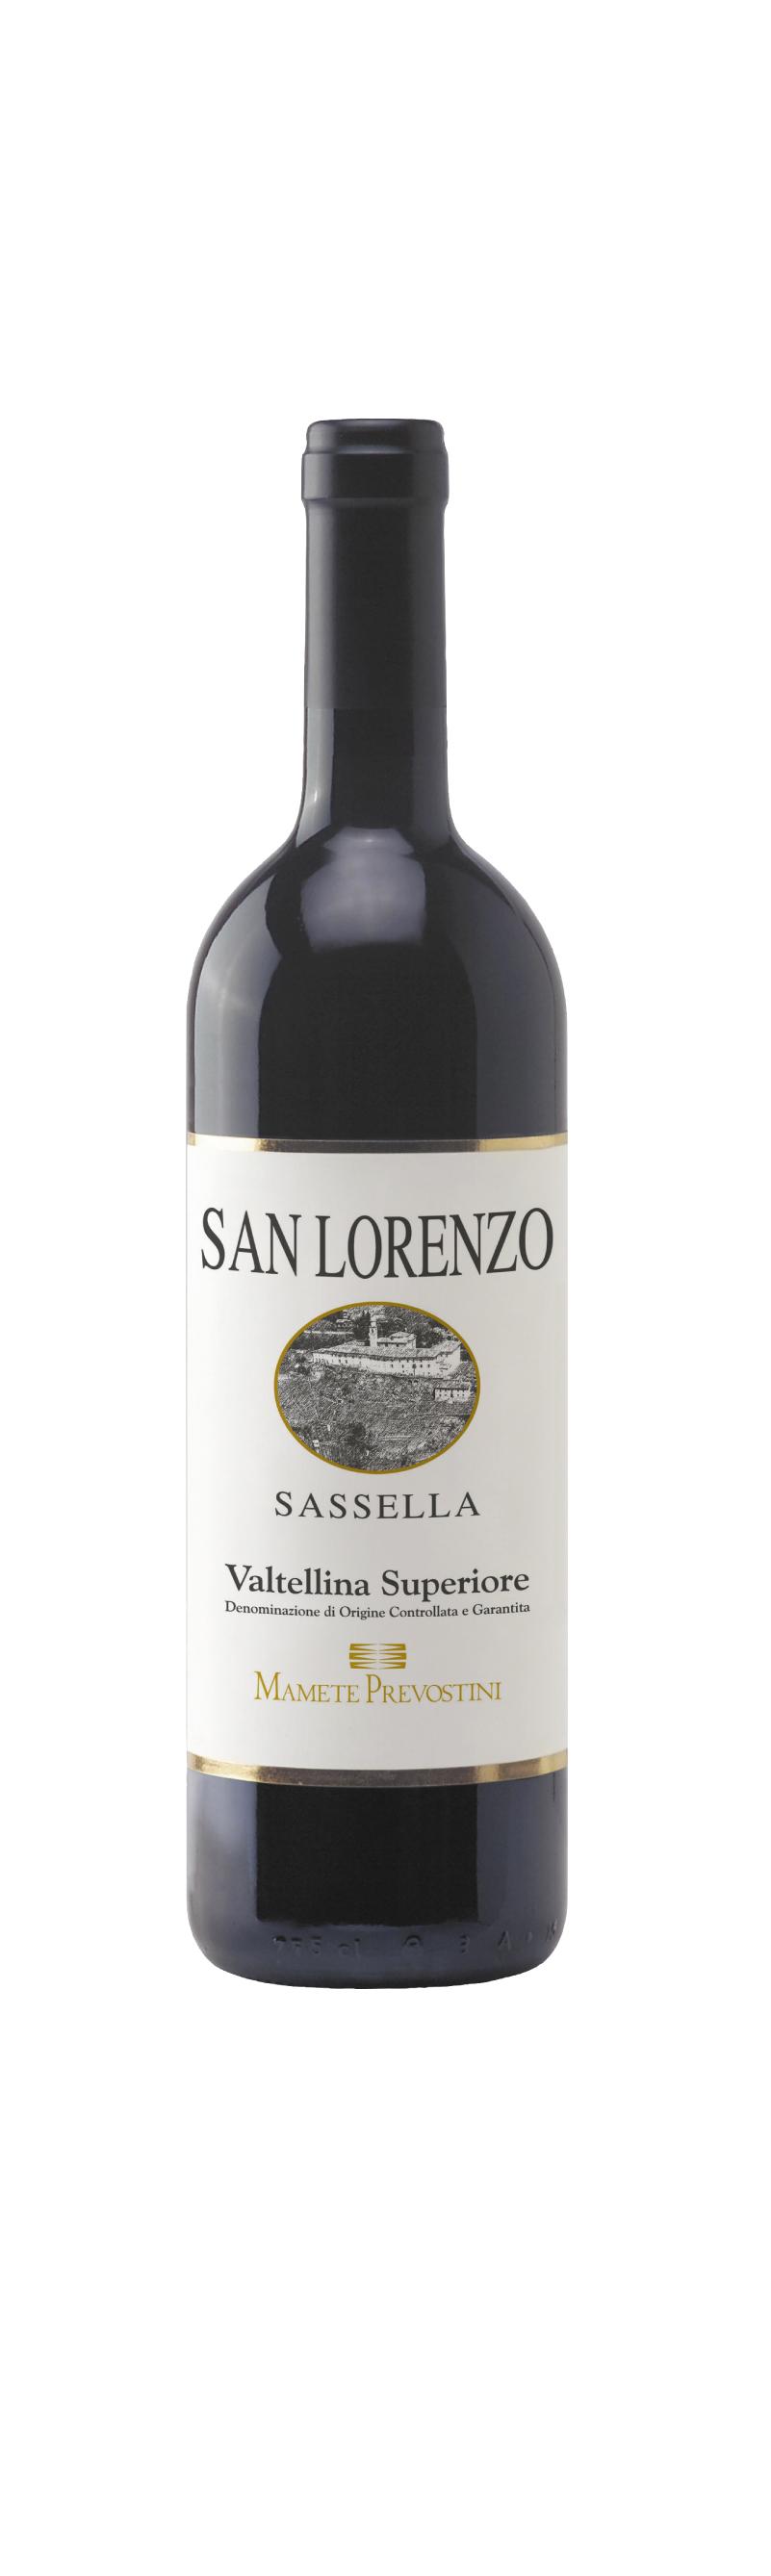 San Lorenzo Sassella Valtellina Superiore Docg